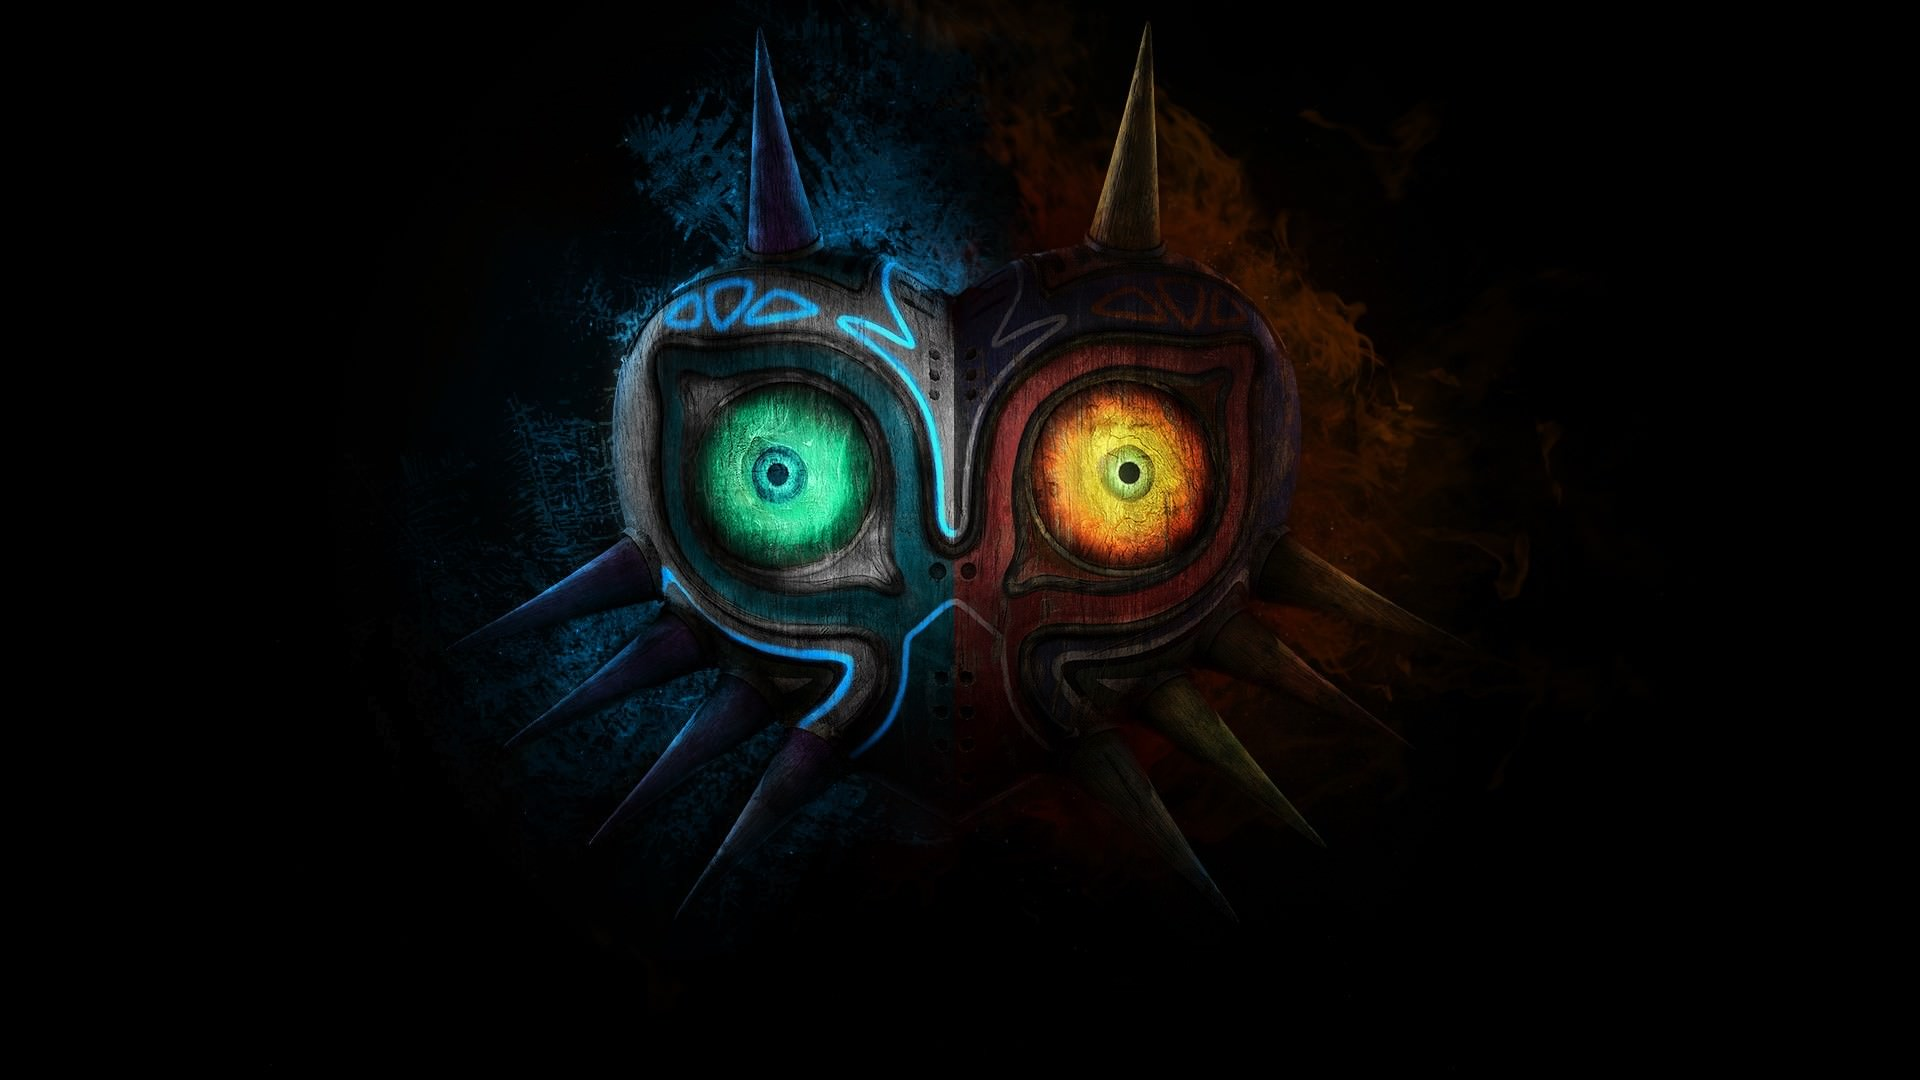 contentuploads201401The Legend Of Zelda Majora Mask Wallpaperjpg 1920x1080